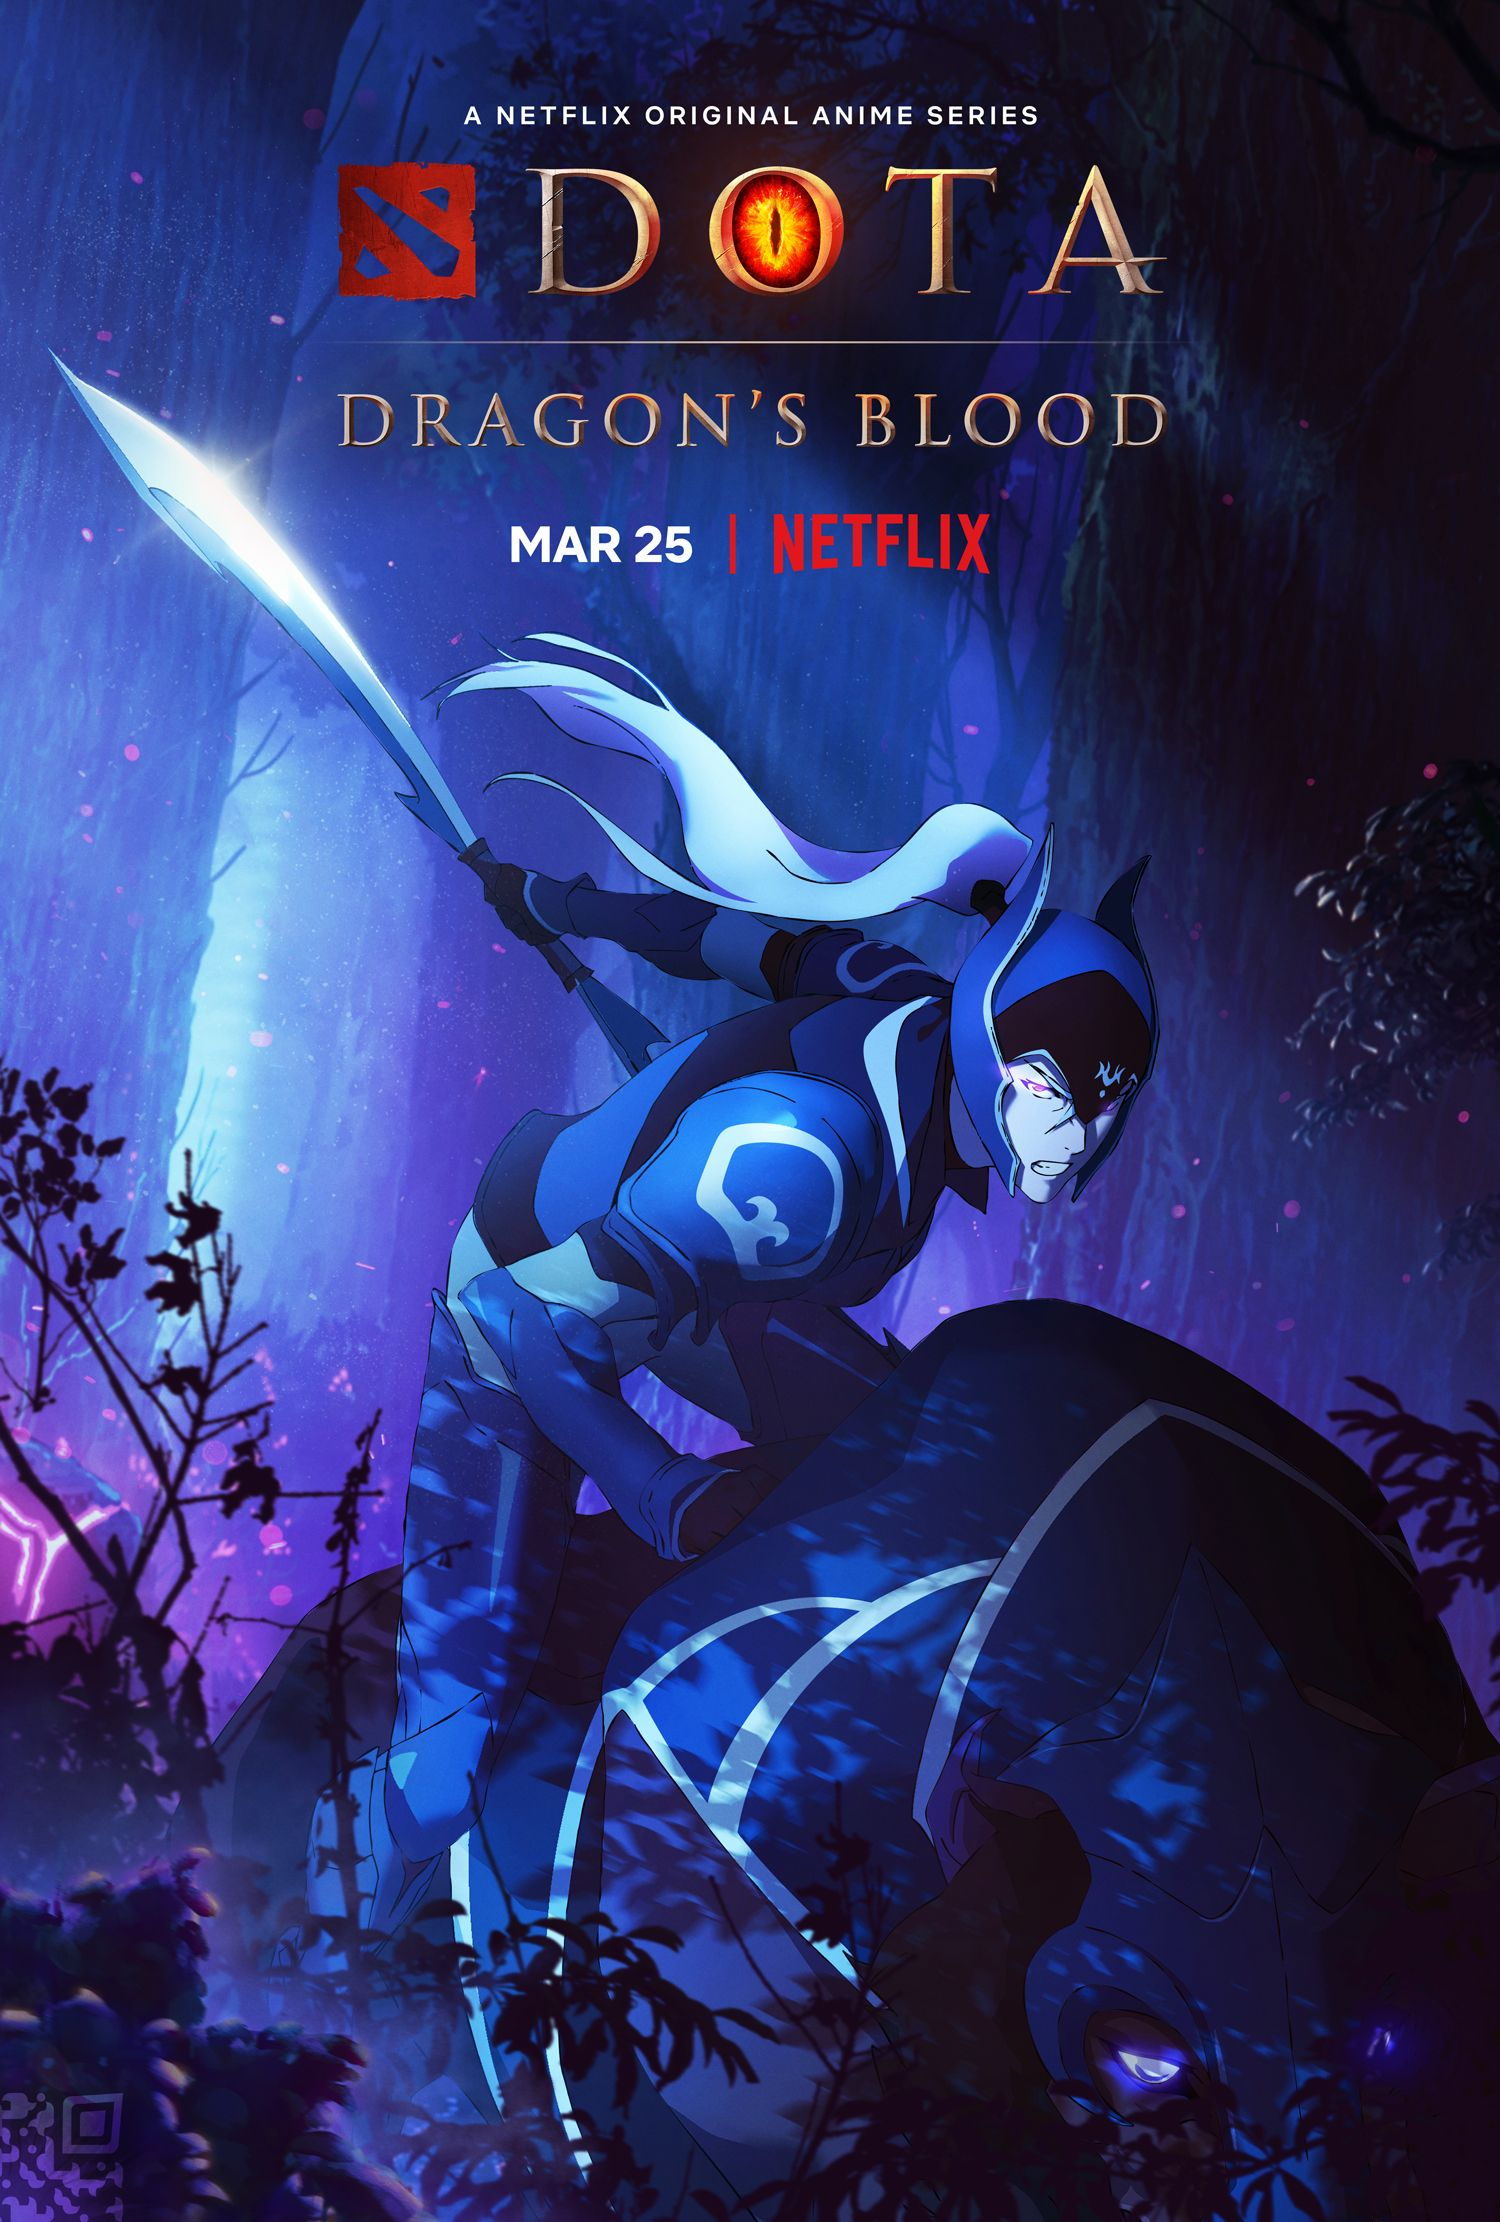 DOTA: Primeiro trailer e pôsteres de Dragon's Blood Drops para a série de anime do Netflix 3